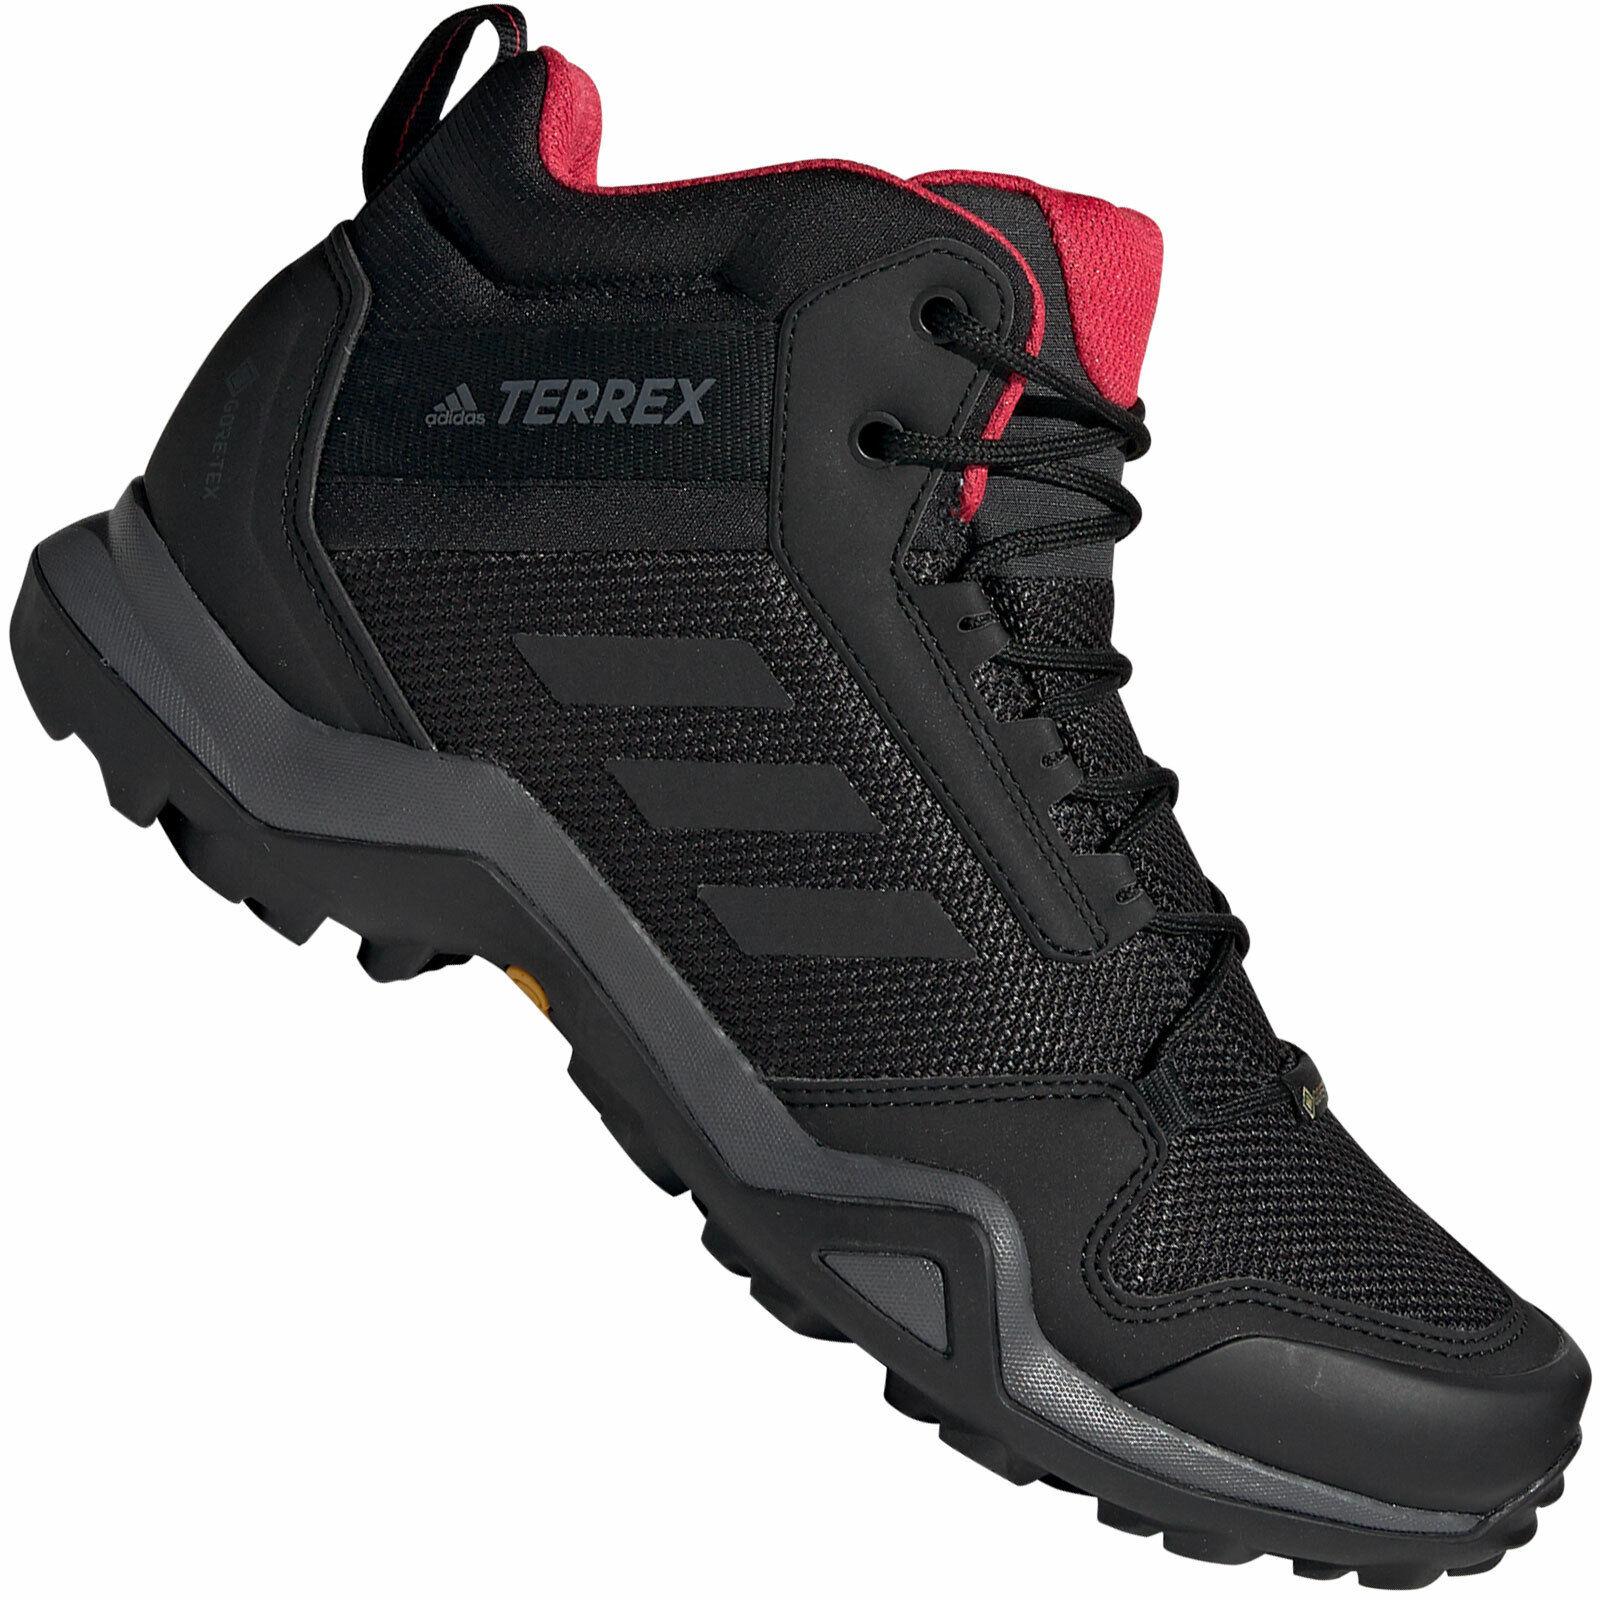 Adidas Performance Terrex AX3 GTX mid Damen Shoes Walking Boots Casual Shoes